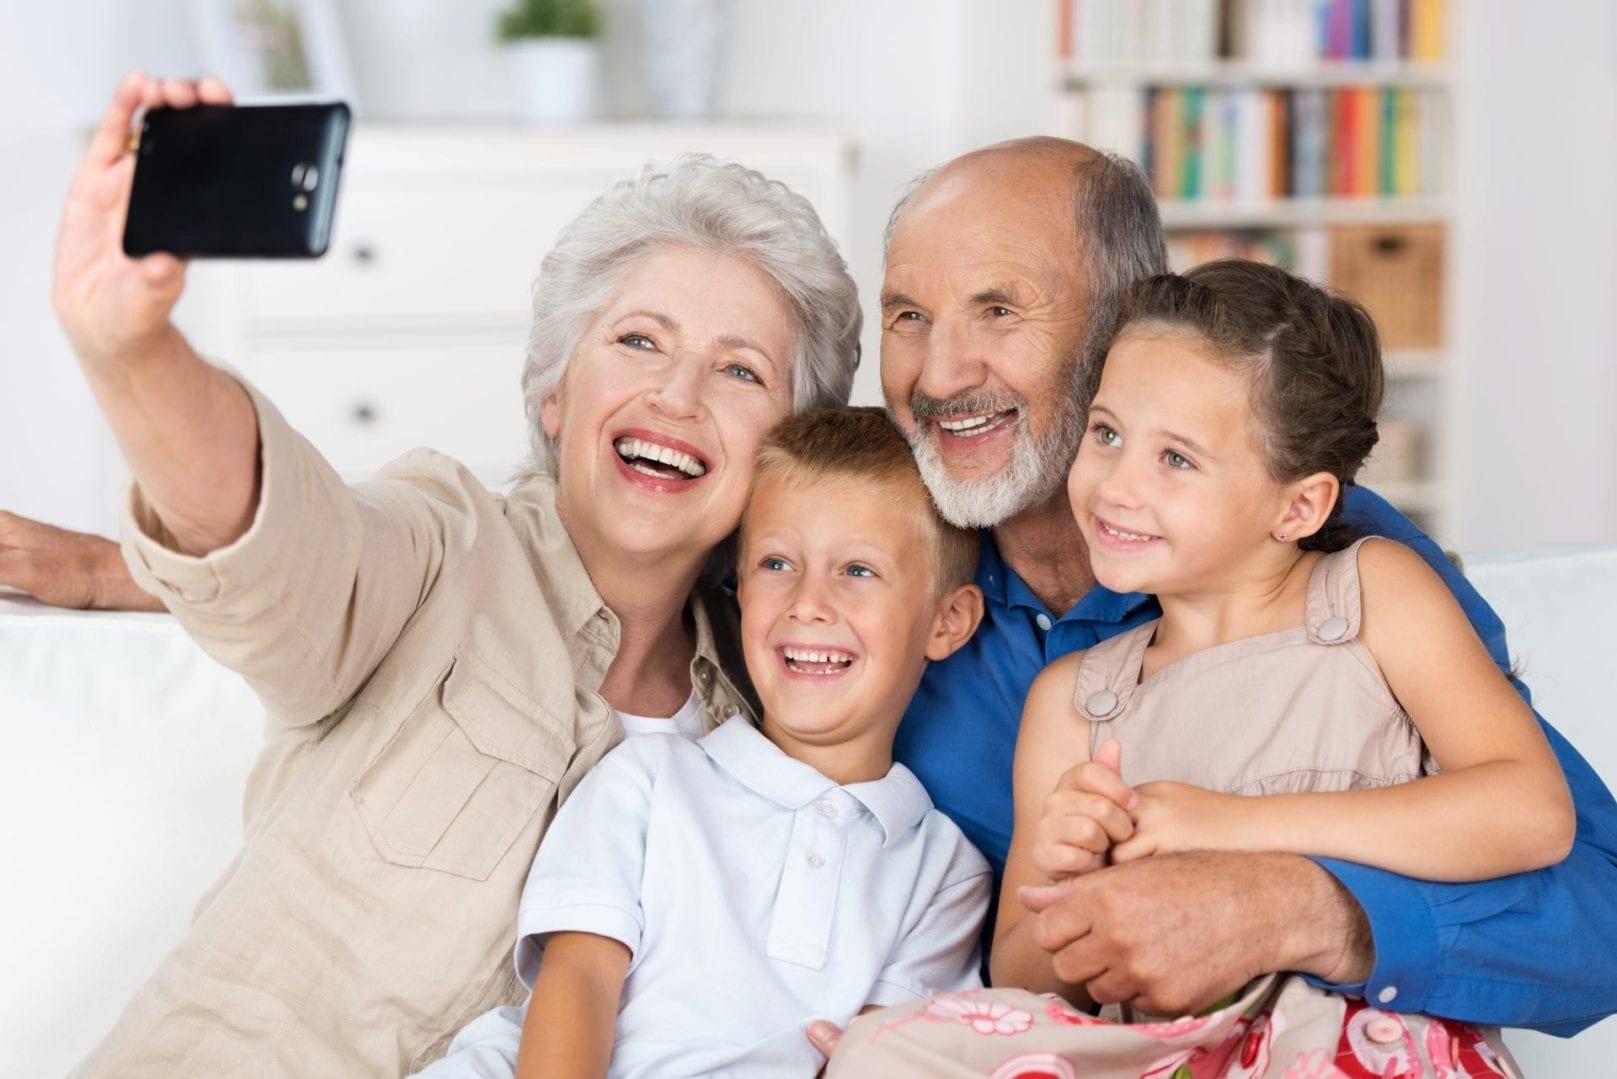 Grandparents taking a photo with grandchildren